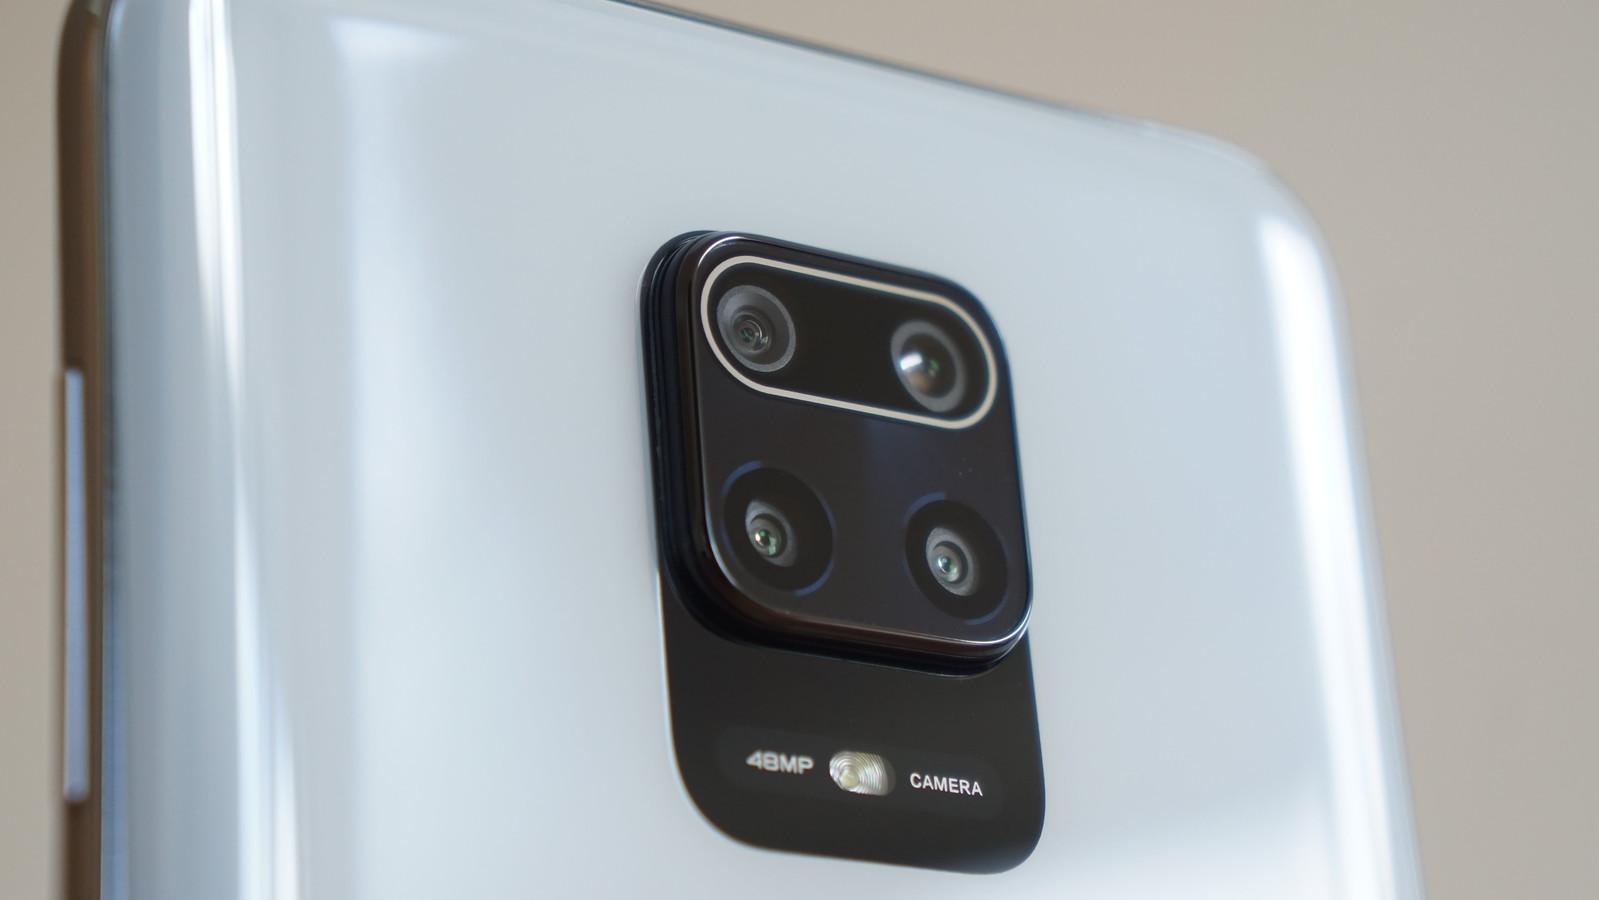 Redmi Note 9S レビュー - 2万円でもキレイに撮れるクアッドカメラ